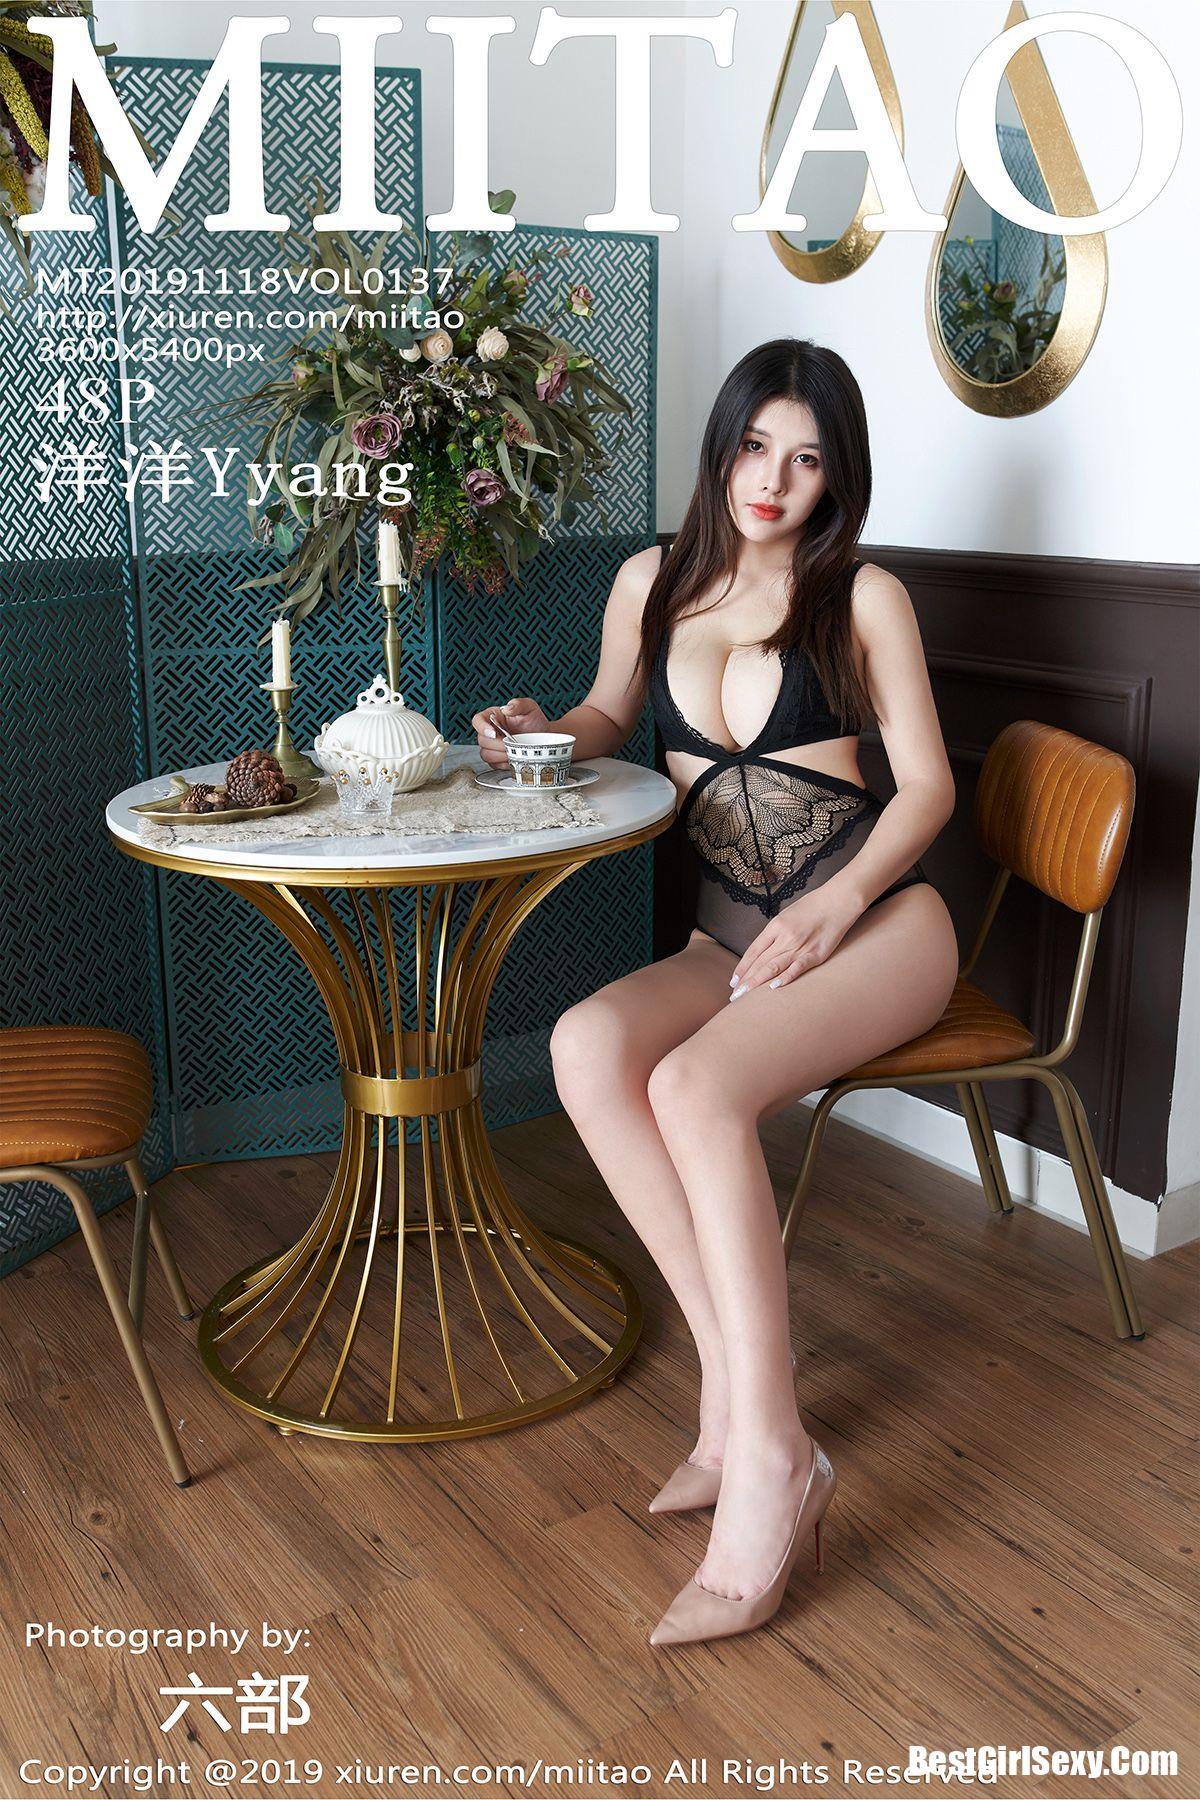 MiiTao Vol.137 Yang Yang Yyang